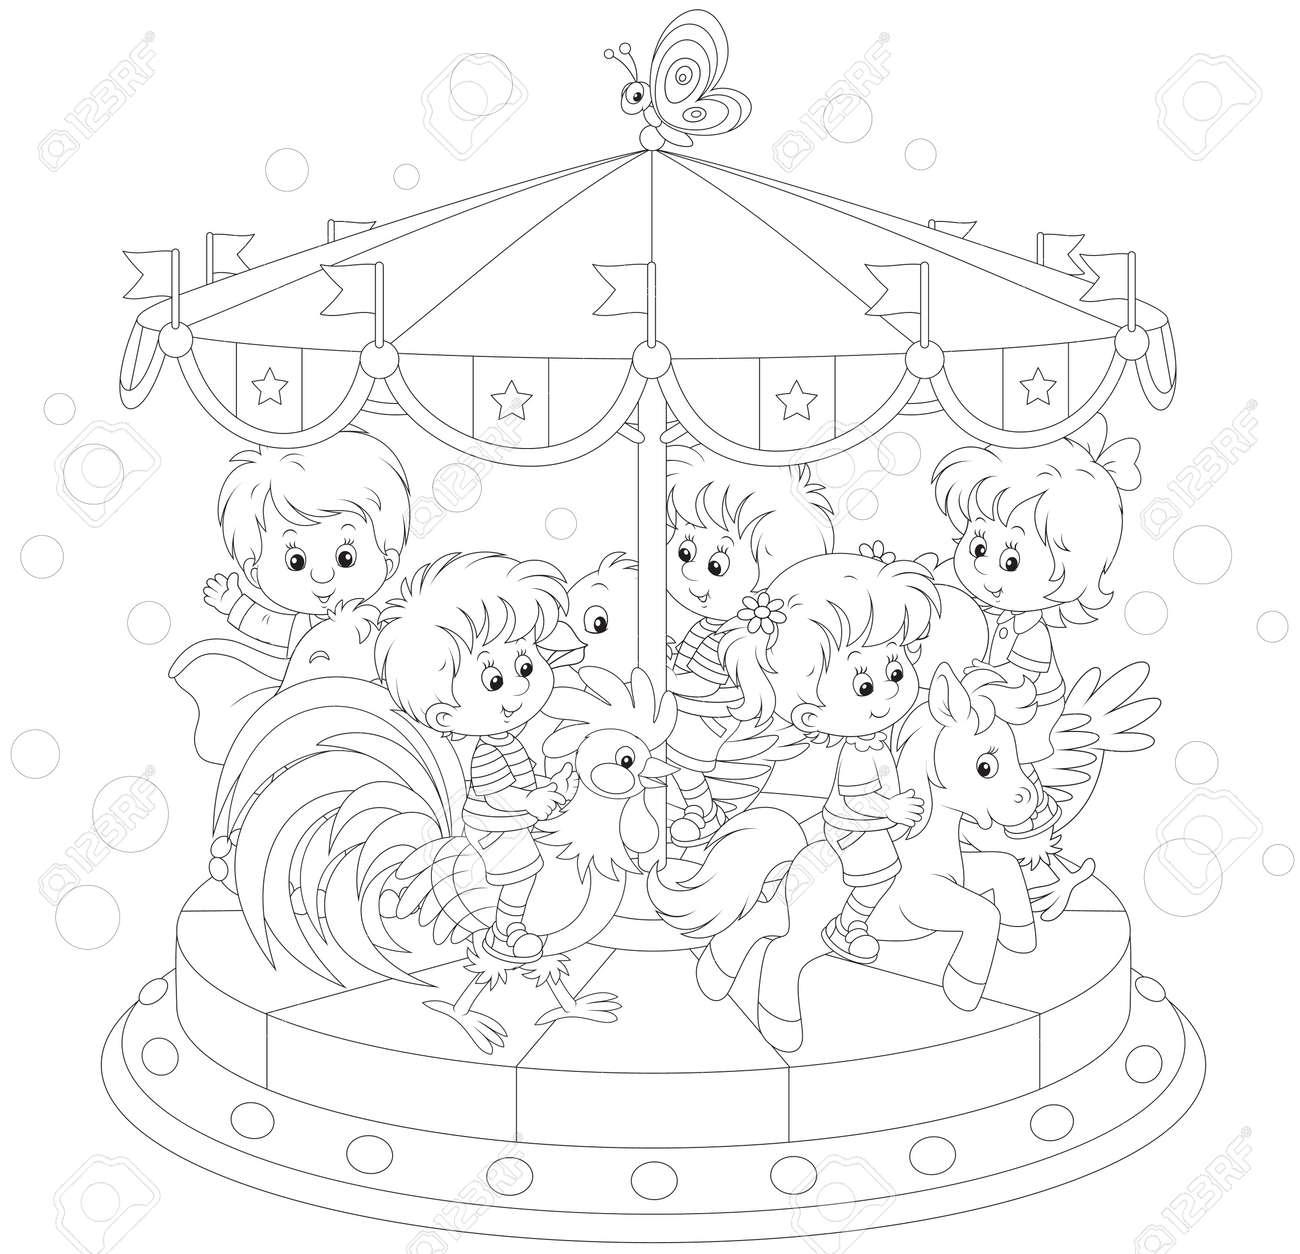 Carousel - 29264913